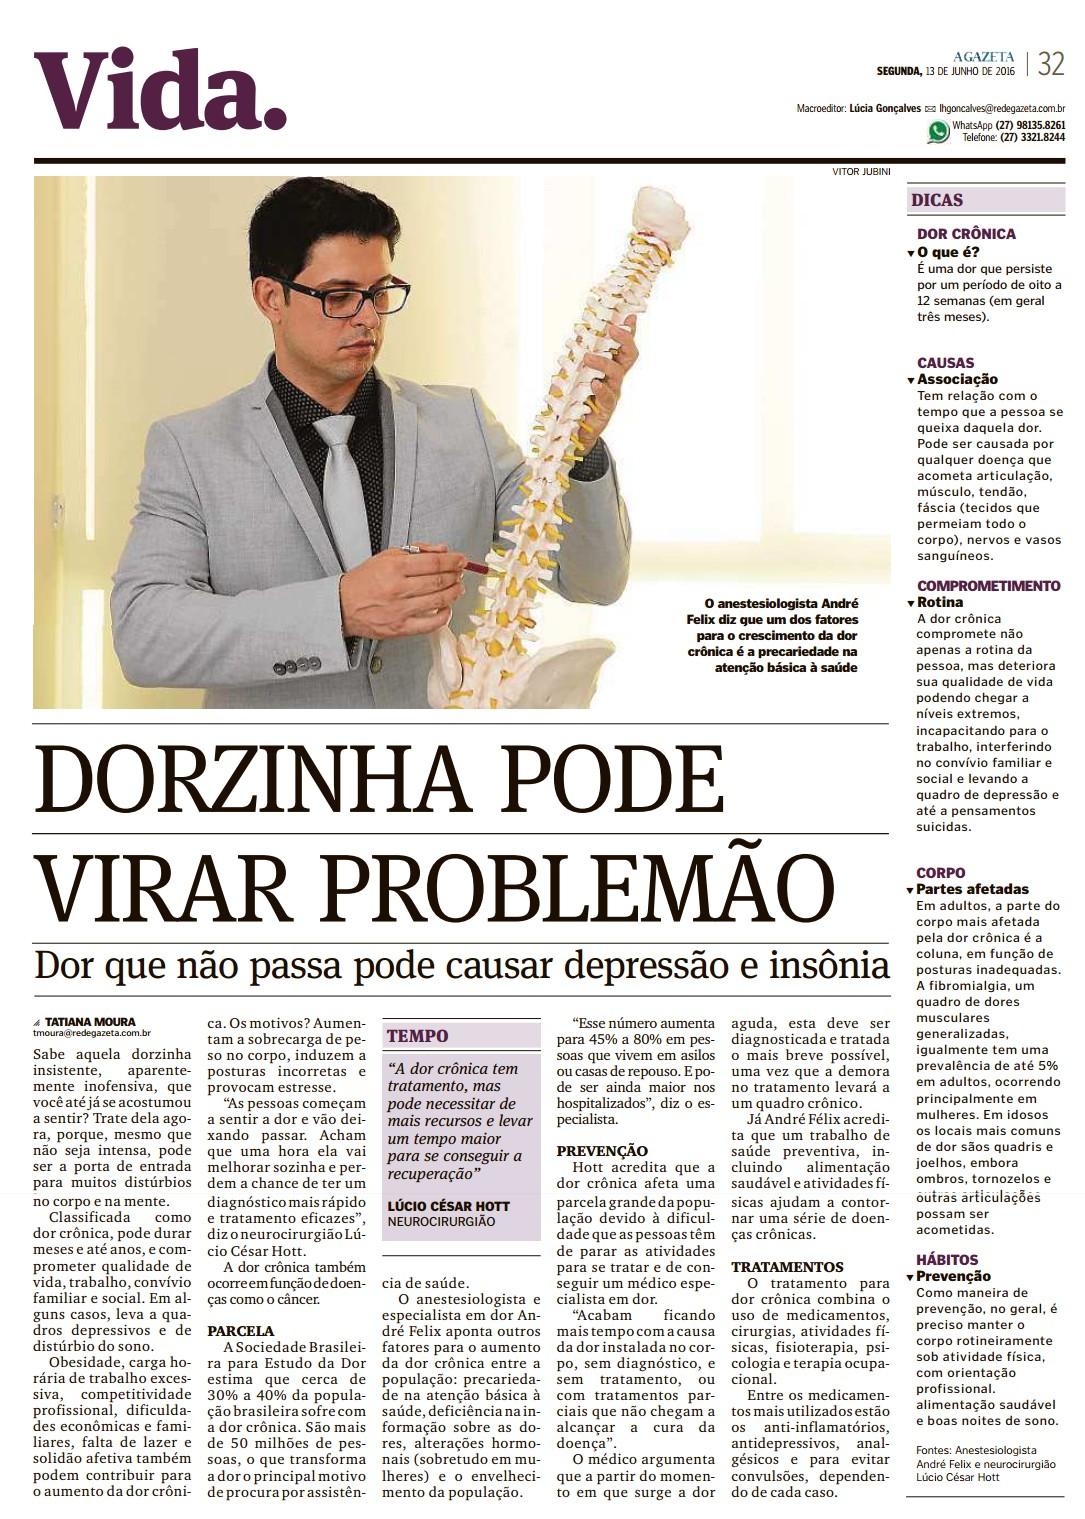 13jun2016-Relevium-Jornal-A-Gazeta-Editoria-vida